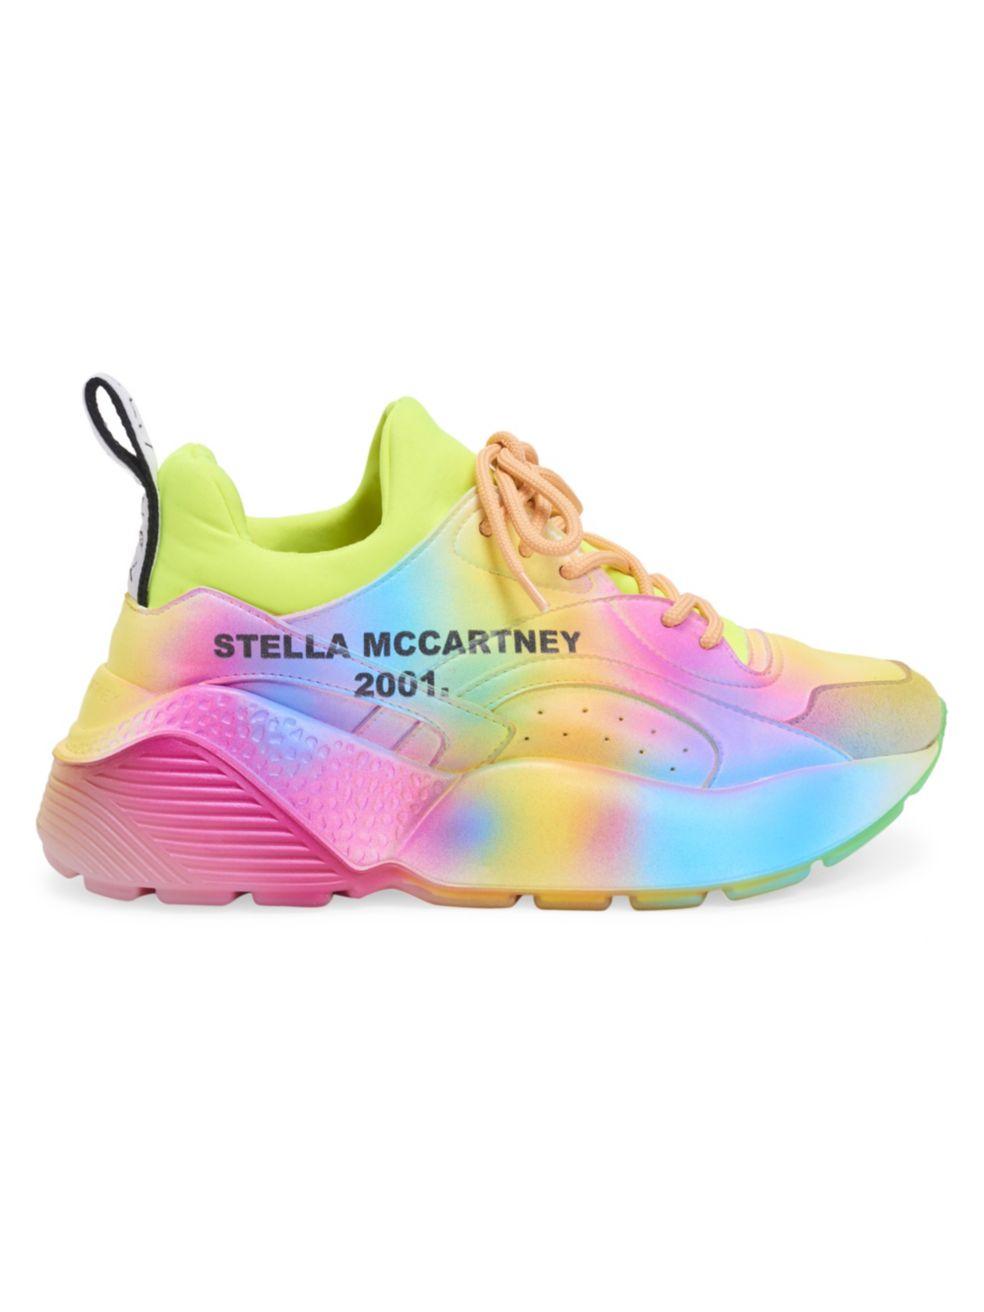 Stella McCartney Eclypse Tie-Dyed